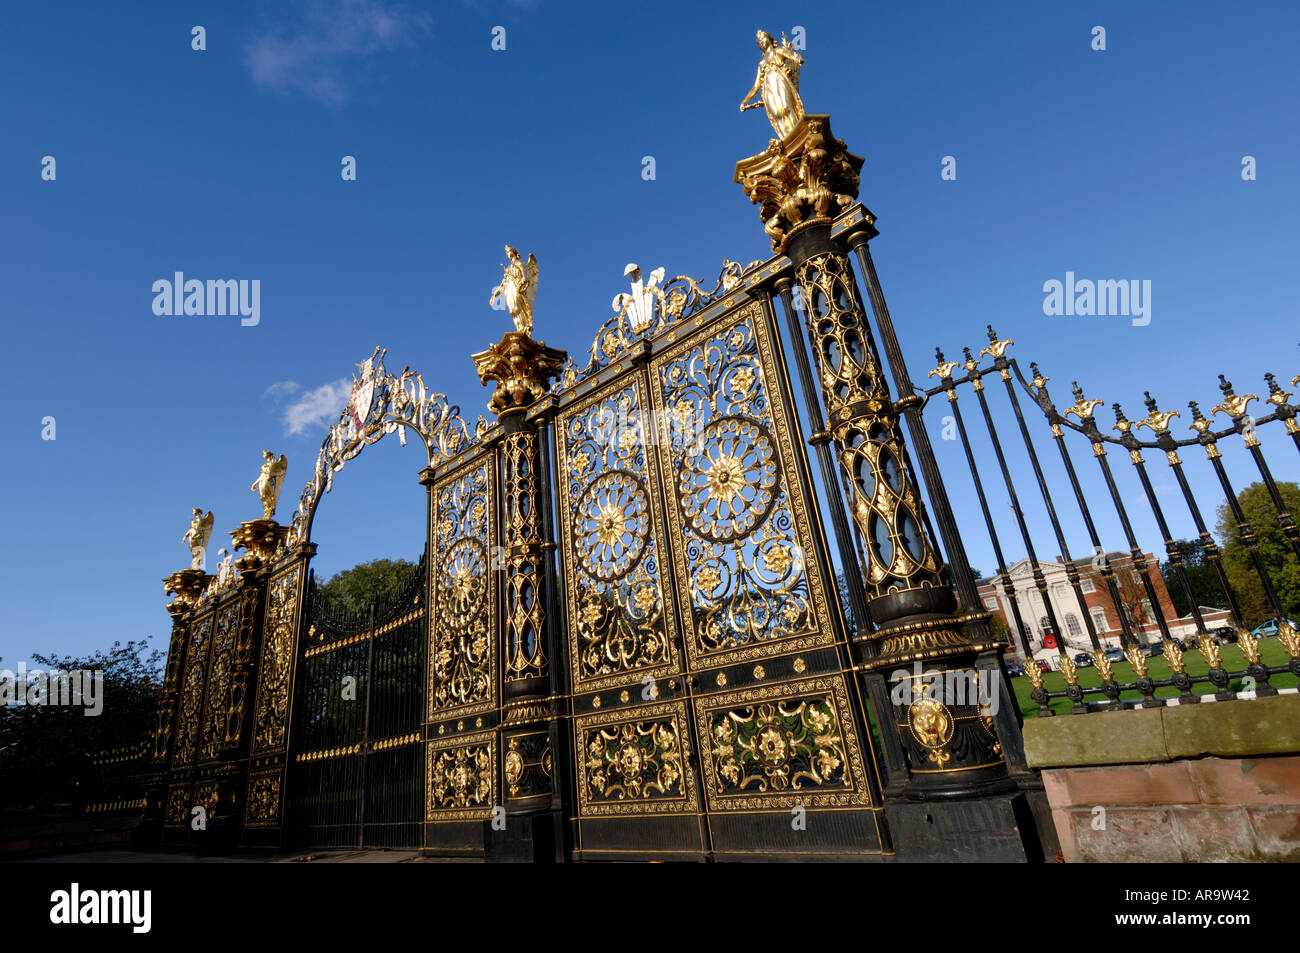 Warrington Town Hall golden gates Cheshire England UK Stock Photo